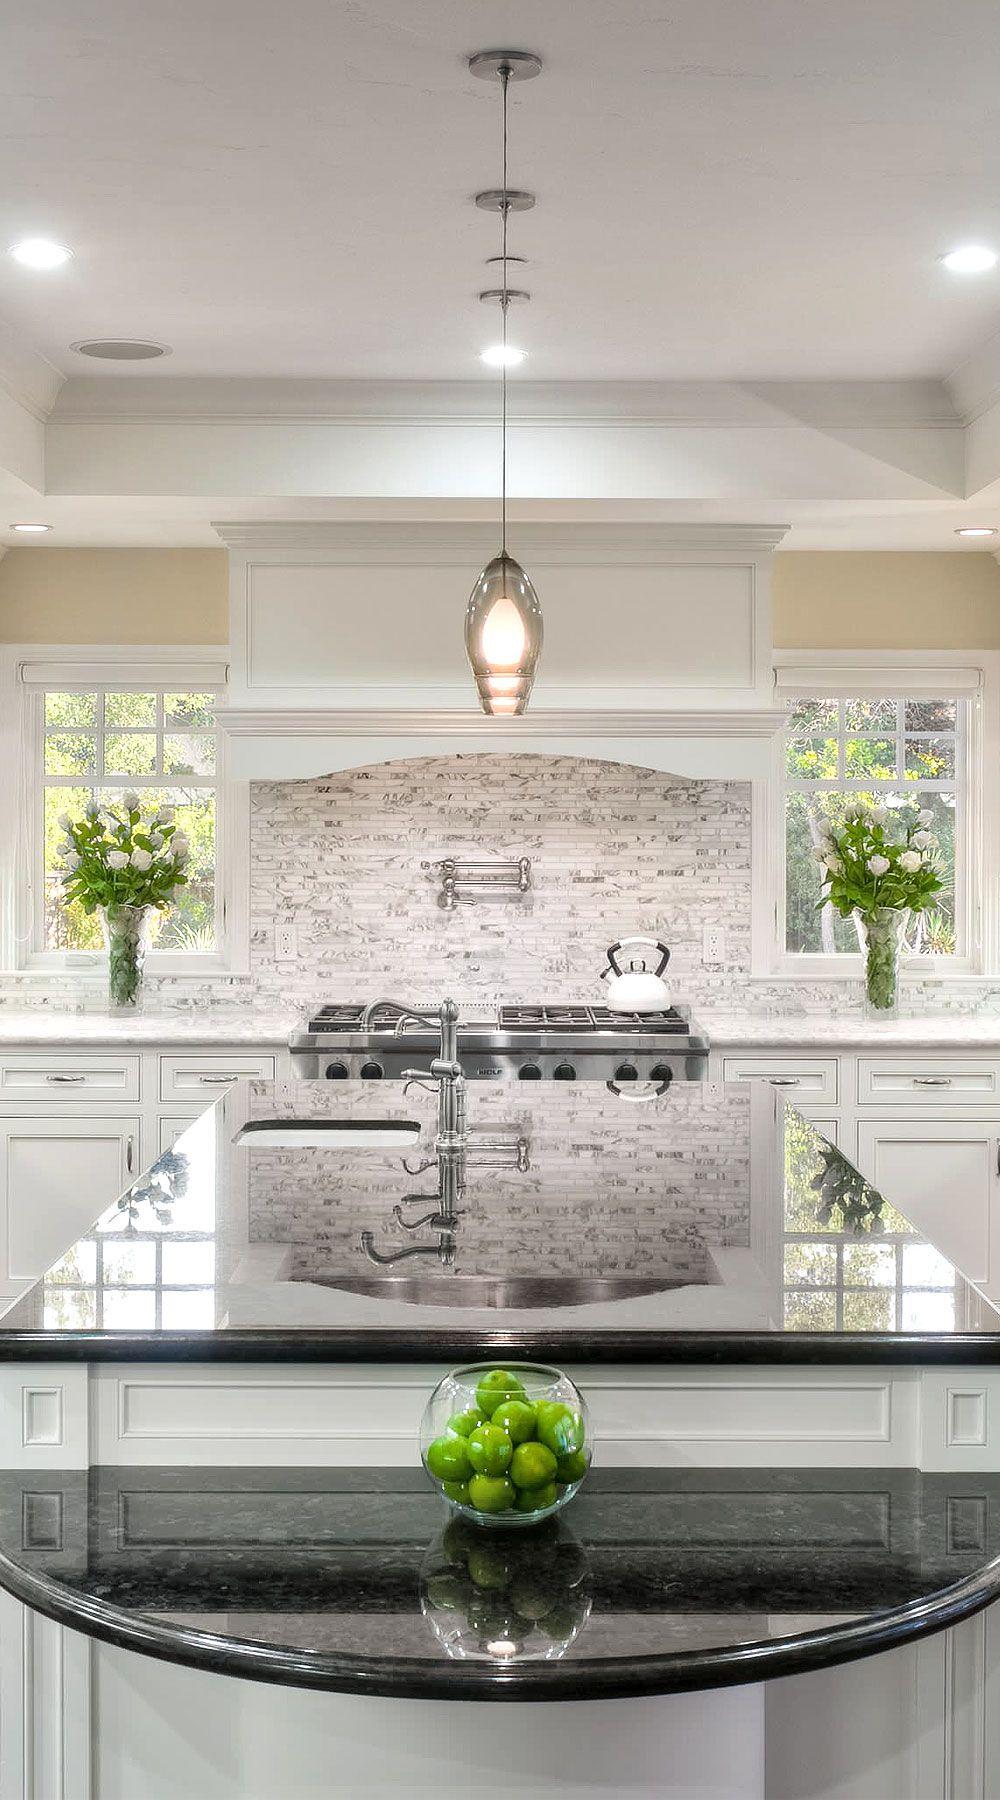 50+ Black Countertop Backsplash Ideas (Tile Designs, Tips ... on Black Countertop Backsplash Ideas  id=18739